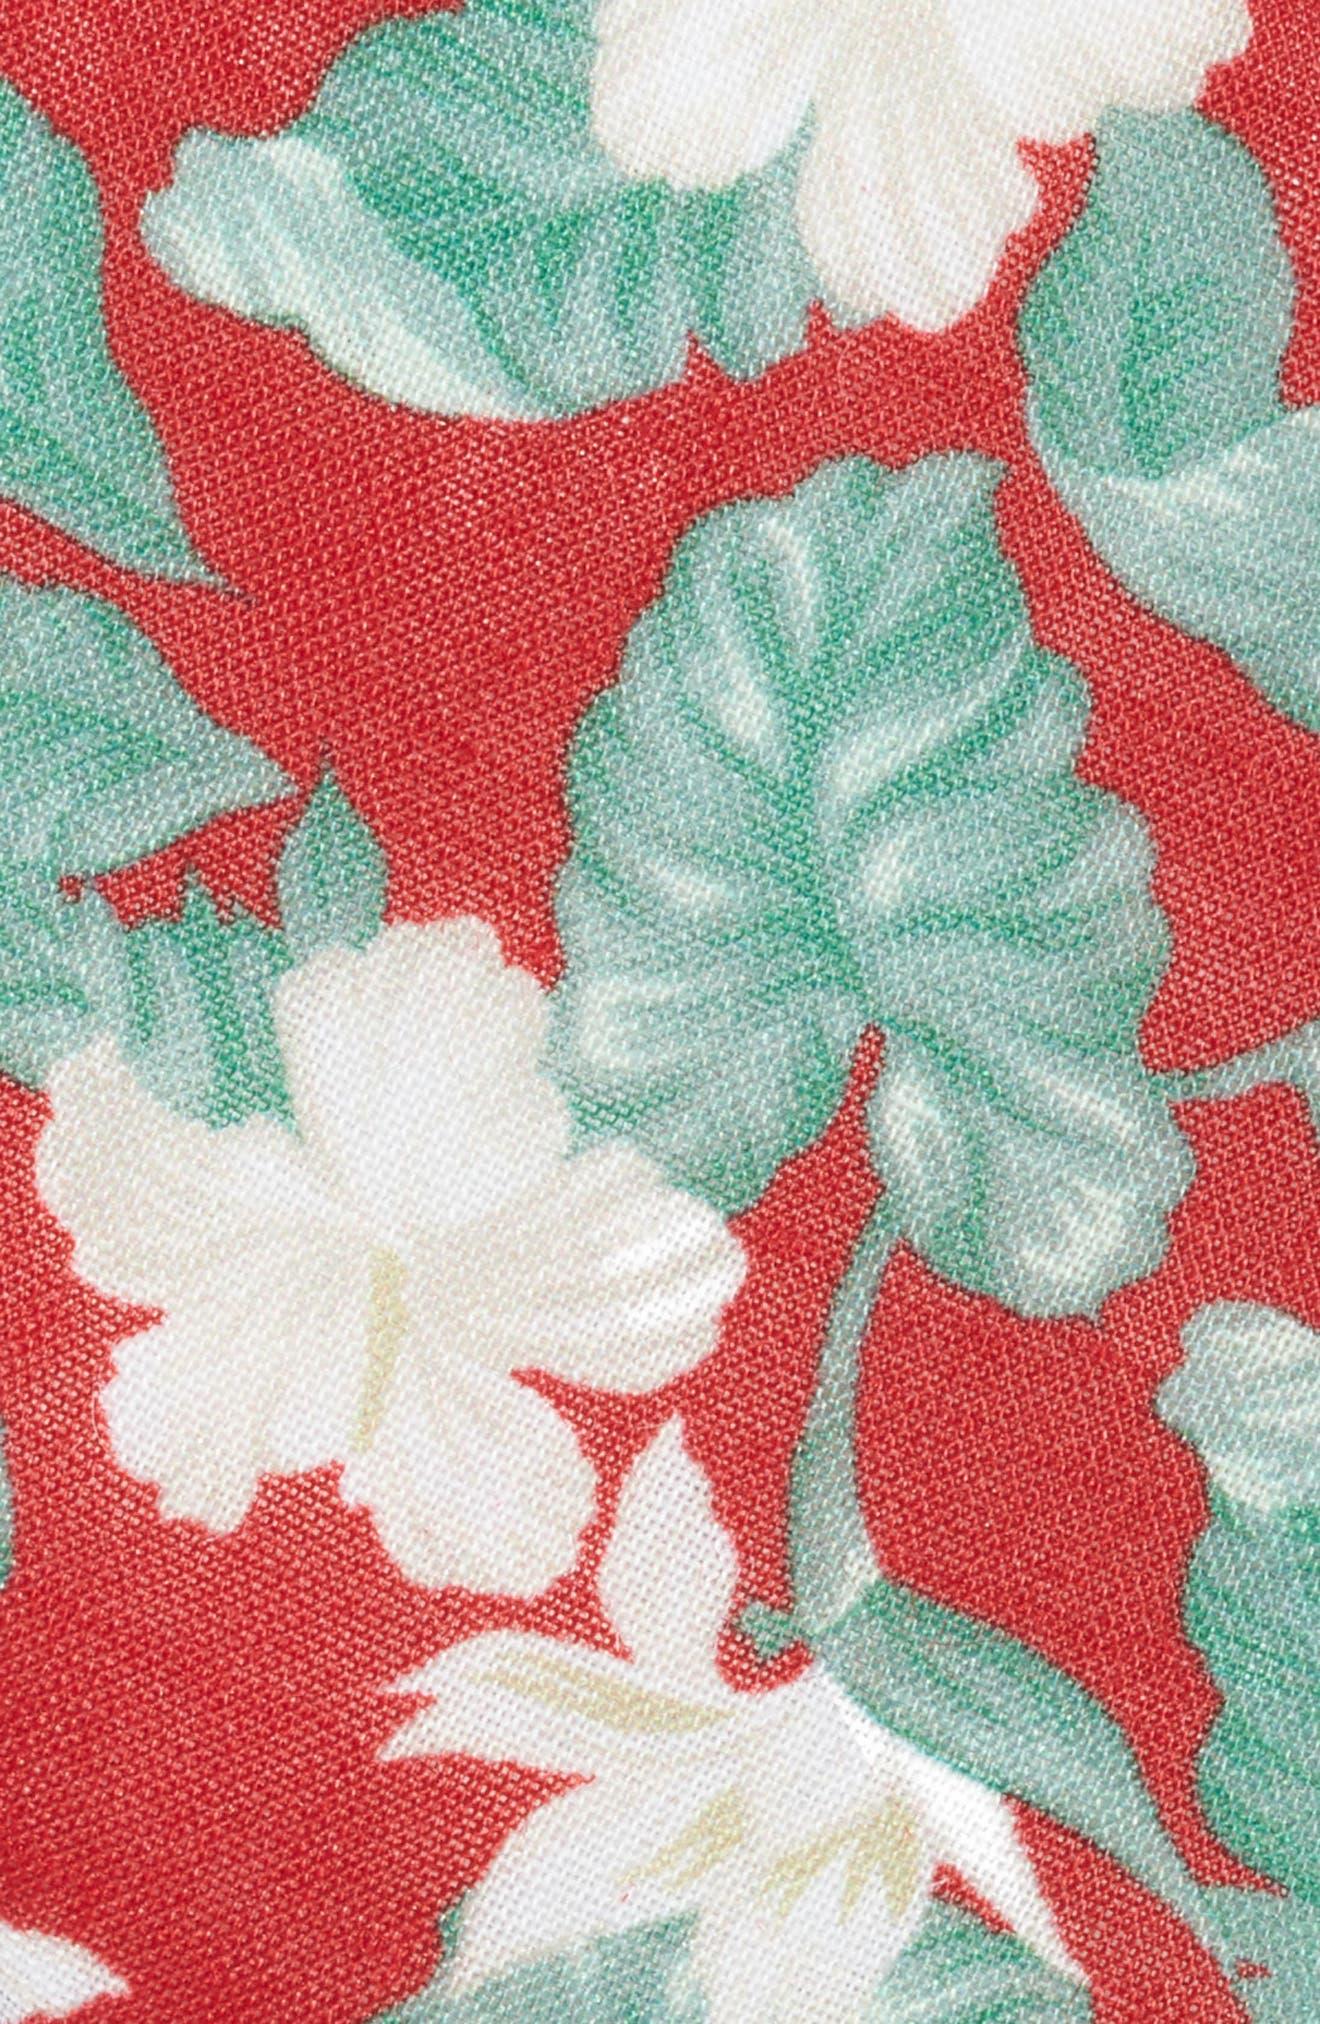 Floral Linen Tie,                             Alternate thumbnail 2, color,                             RED